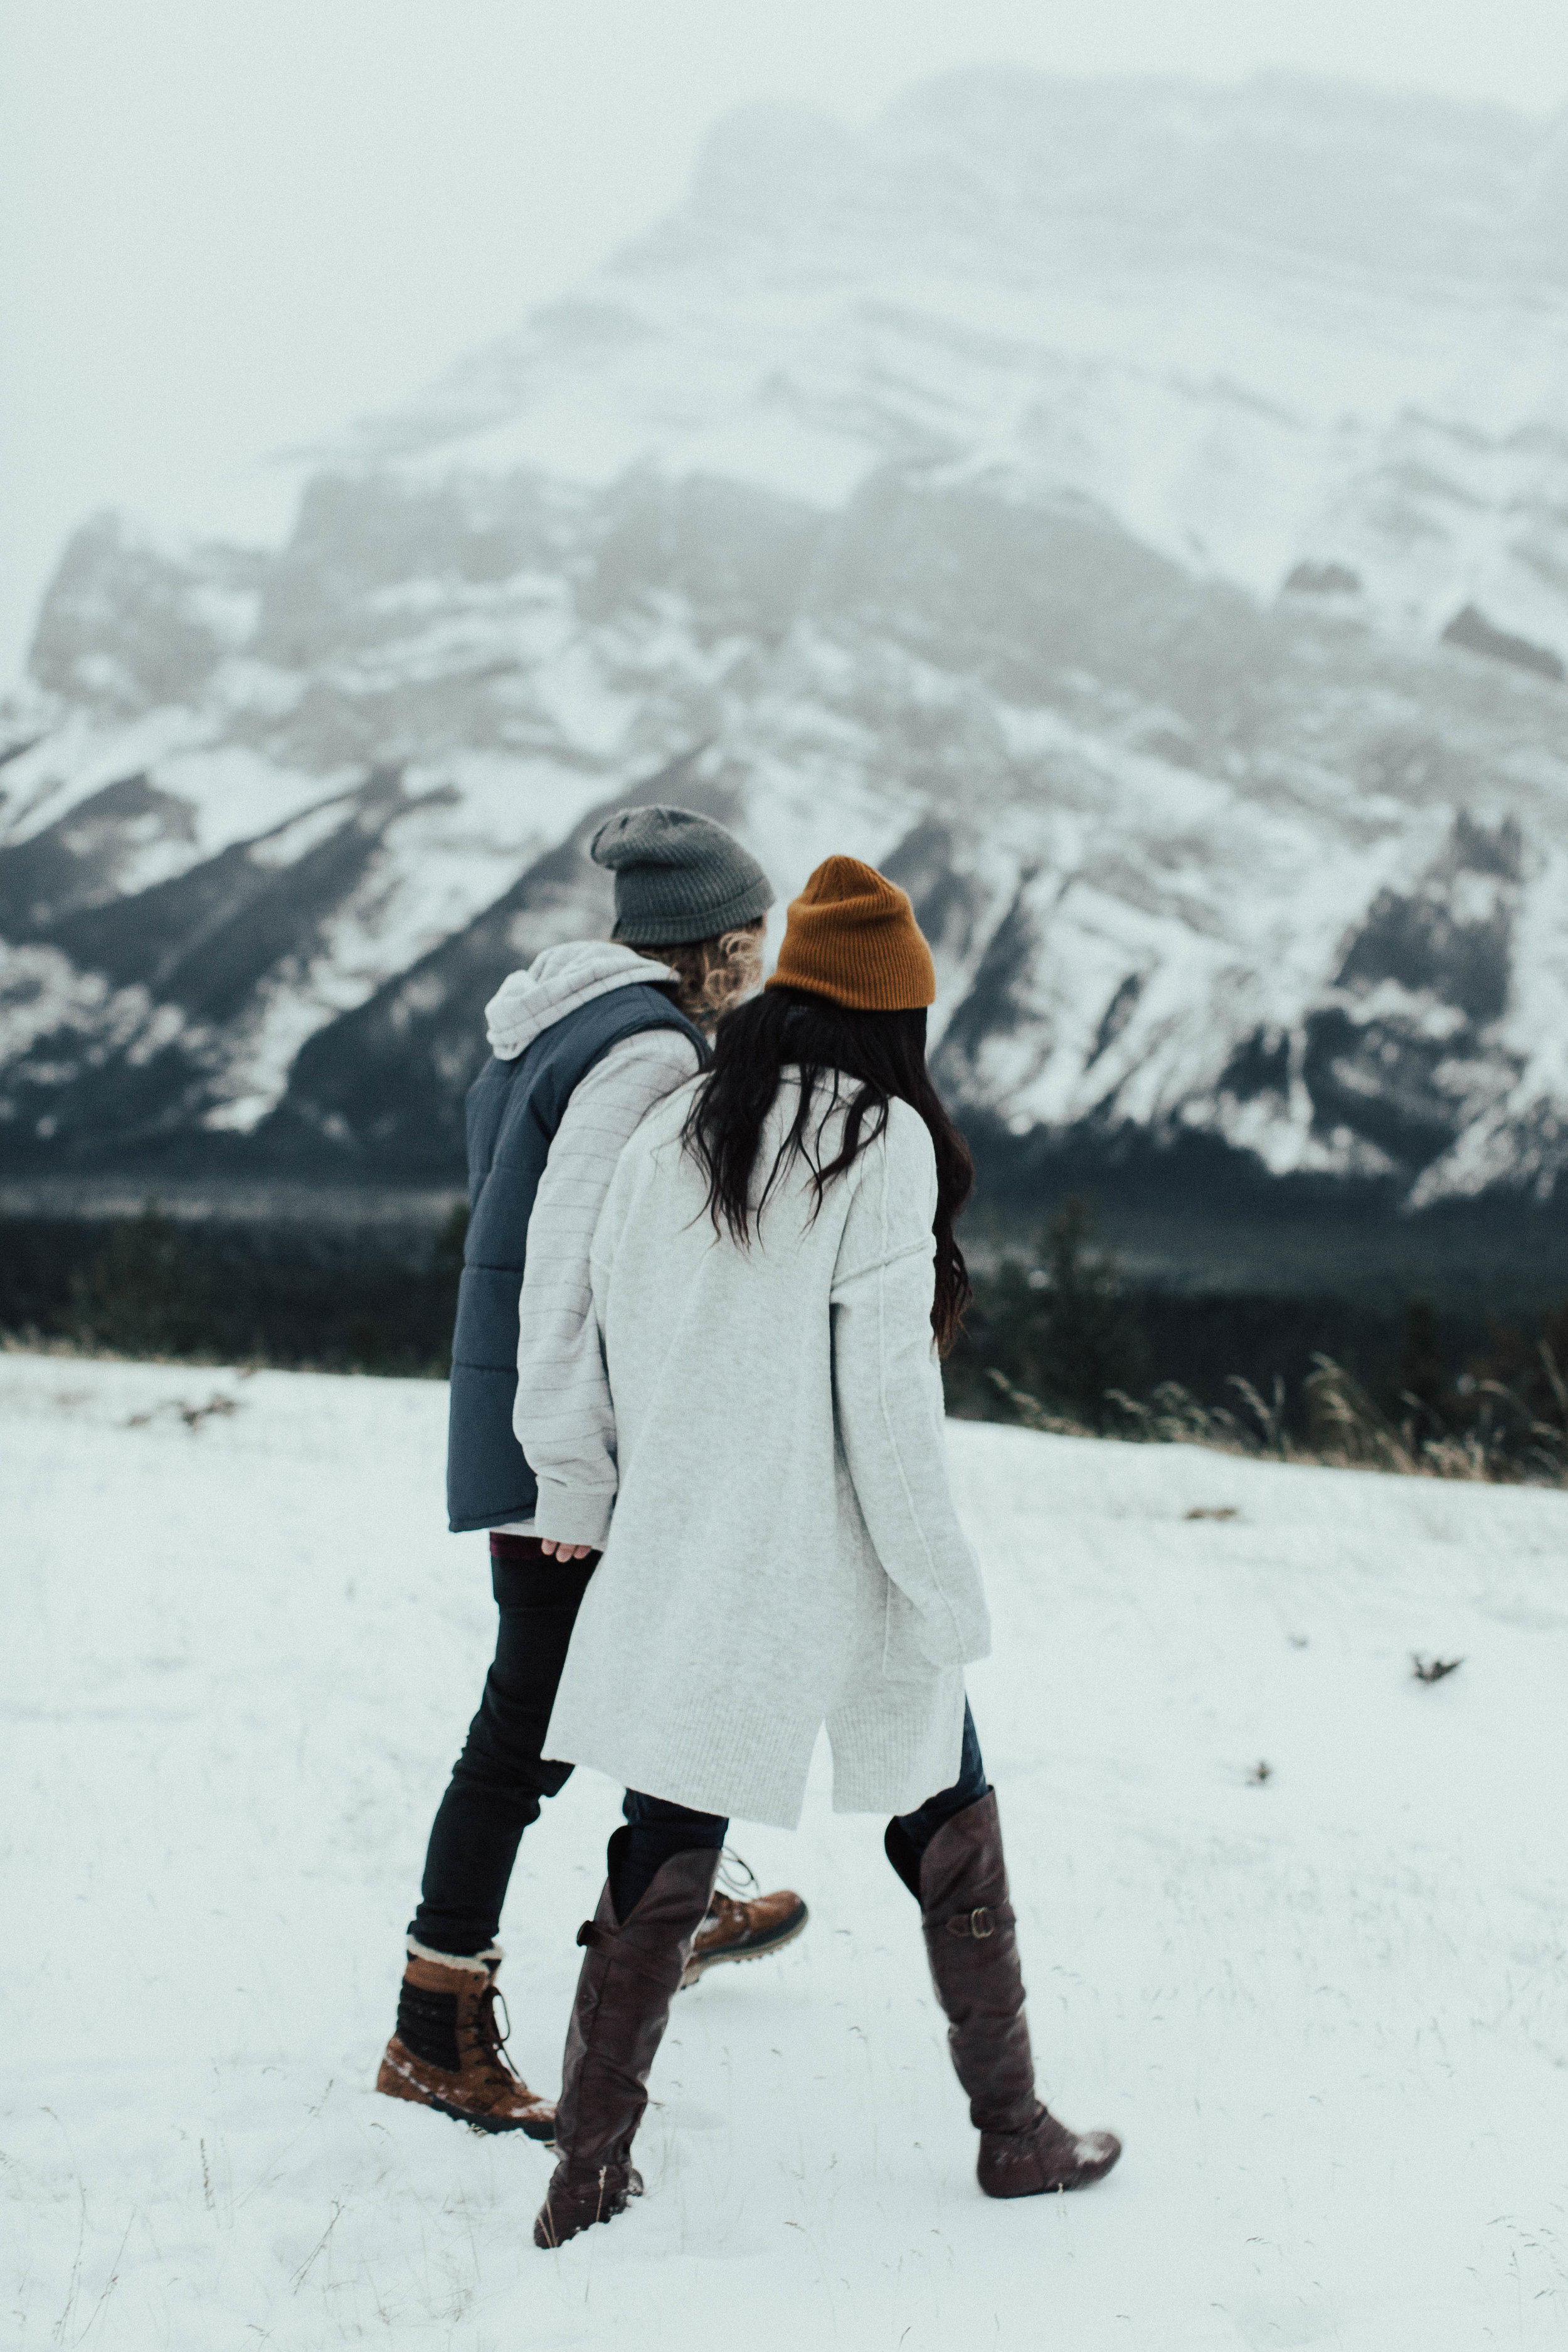 Banff Engagement Photographer - Winter Mountain Adventure Engagement Session - Michelle Larmand Photography-001